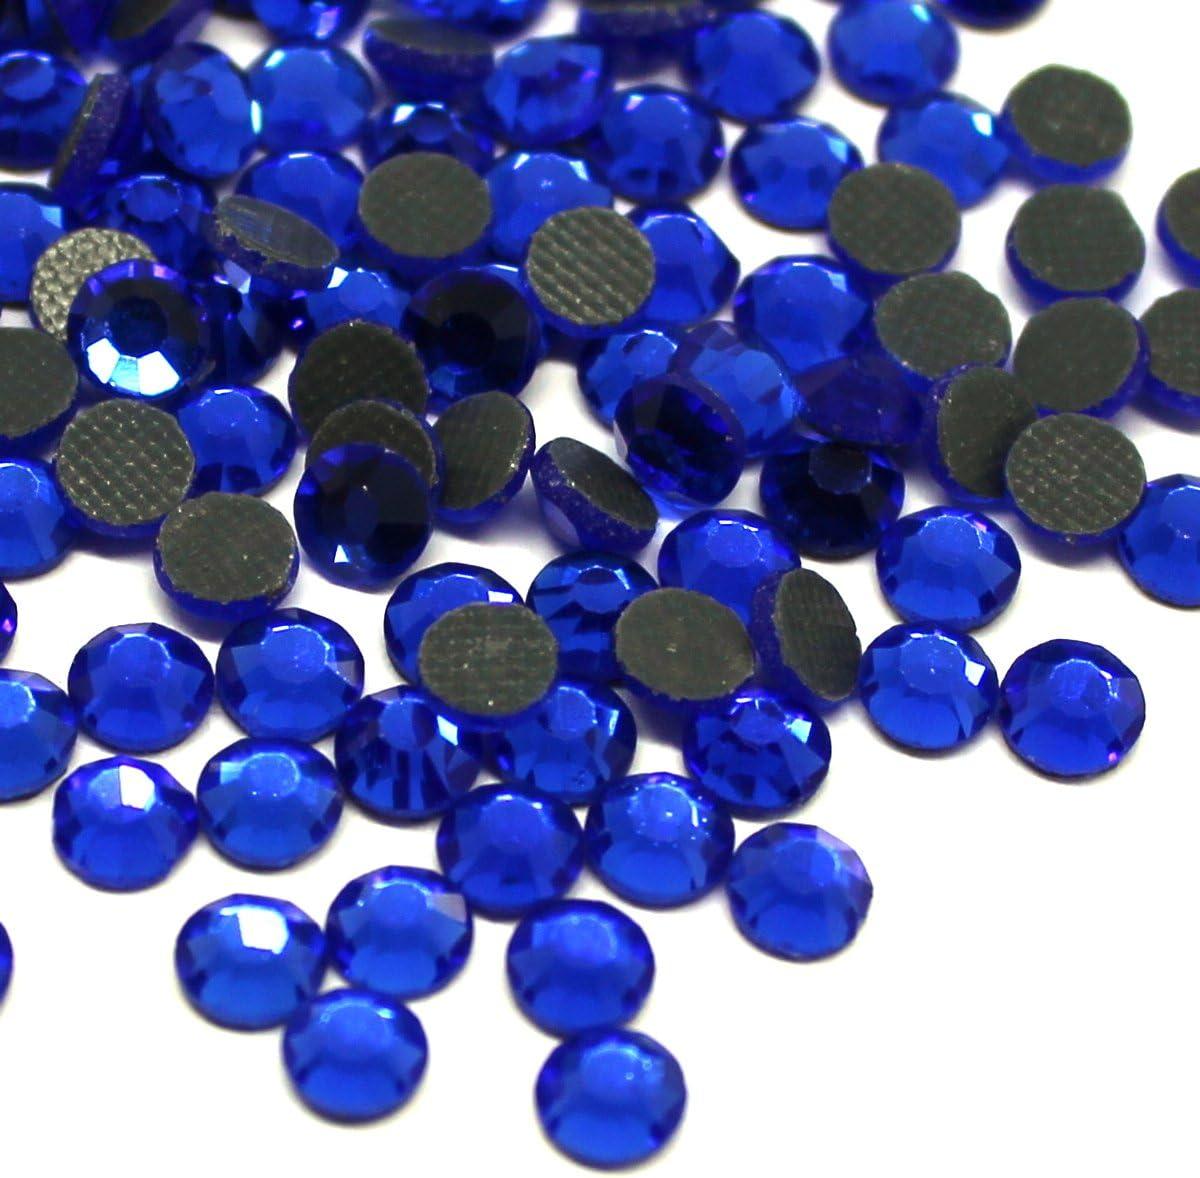 Hotfix Rhinestones Zbella Crystal Hot Fix Rhinestones 10 Gross ss10, Crystal 1440 Stones//pkg